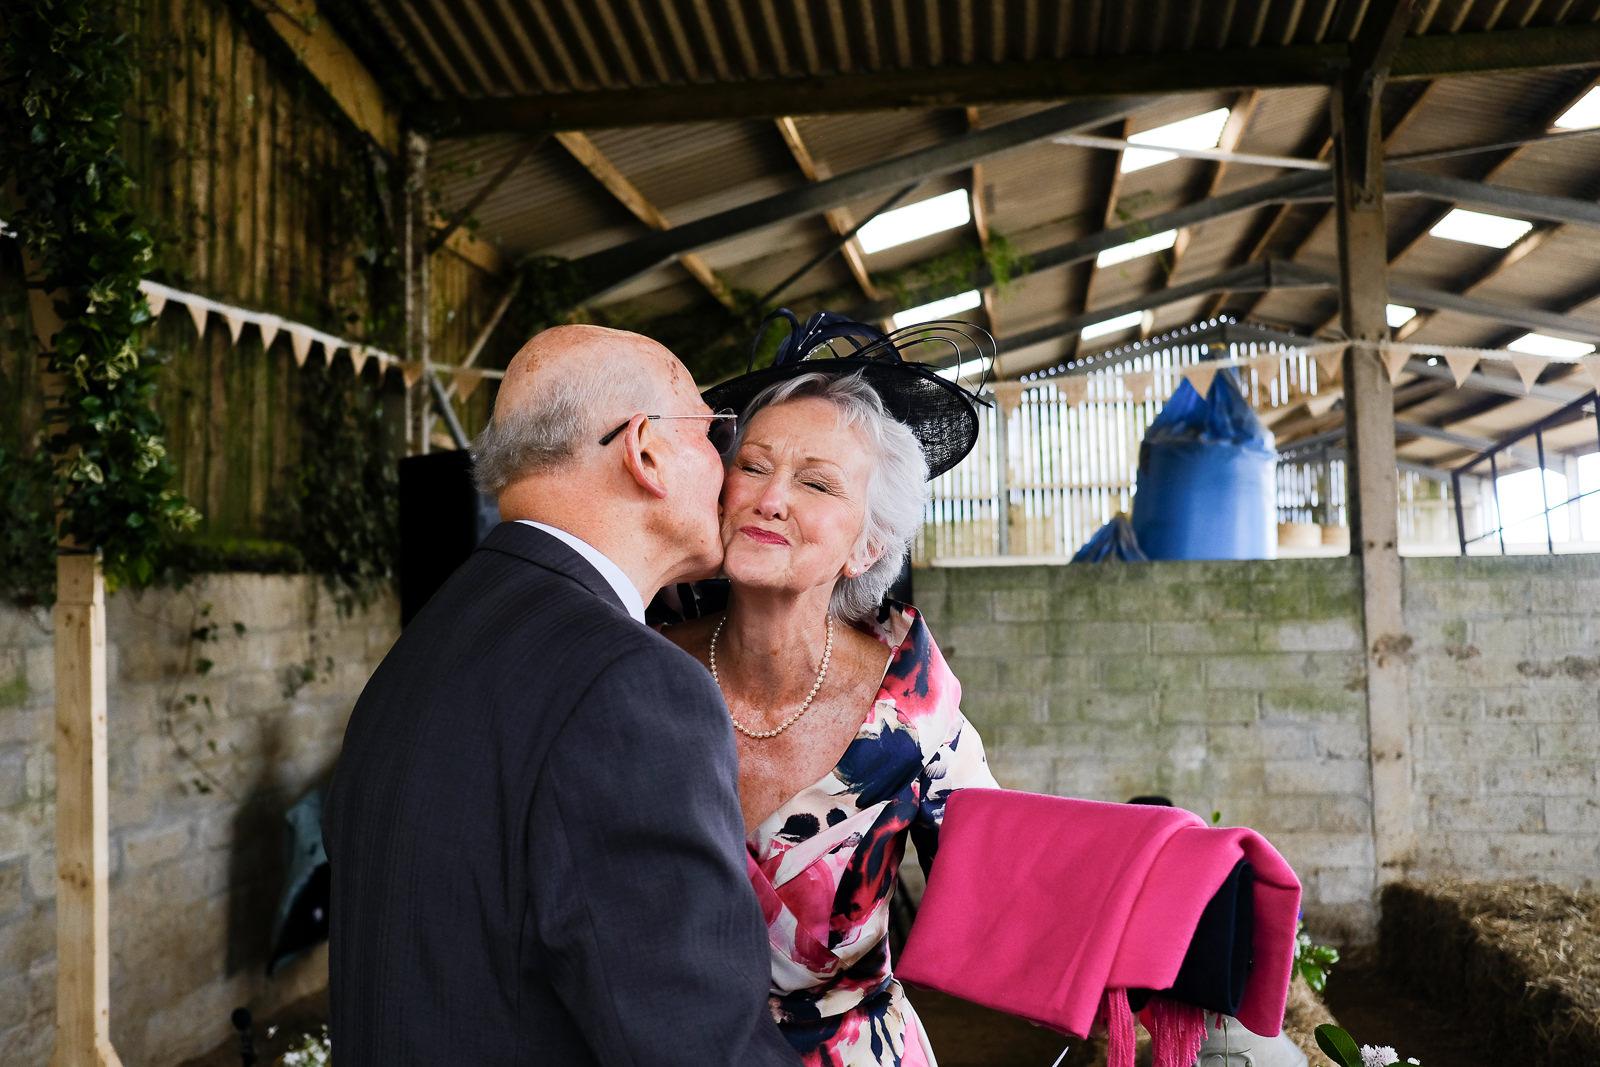 Roscarrock Farm wedding in Cornwall 025.jpg